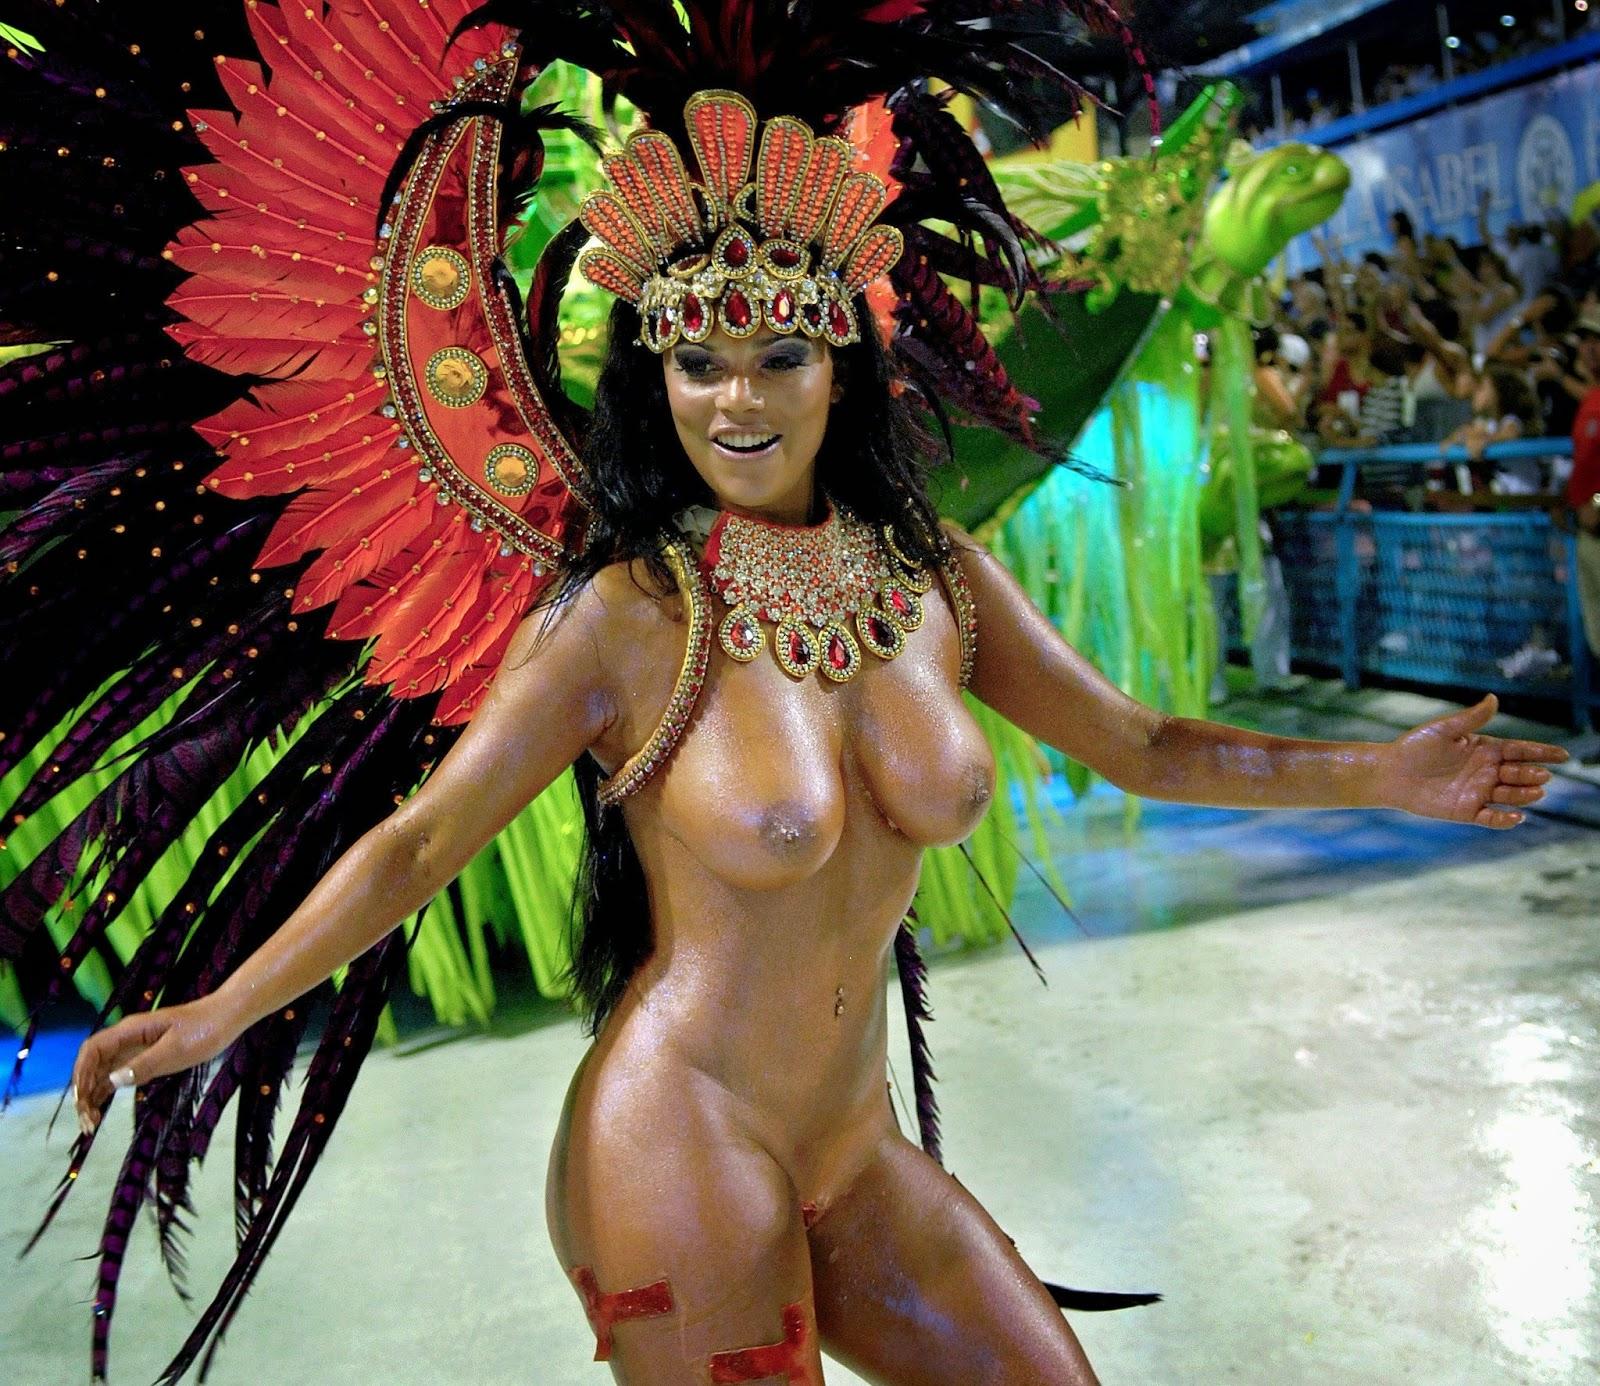 Карнавал бразильский видео порно онлайн